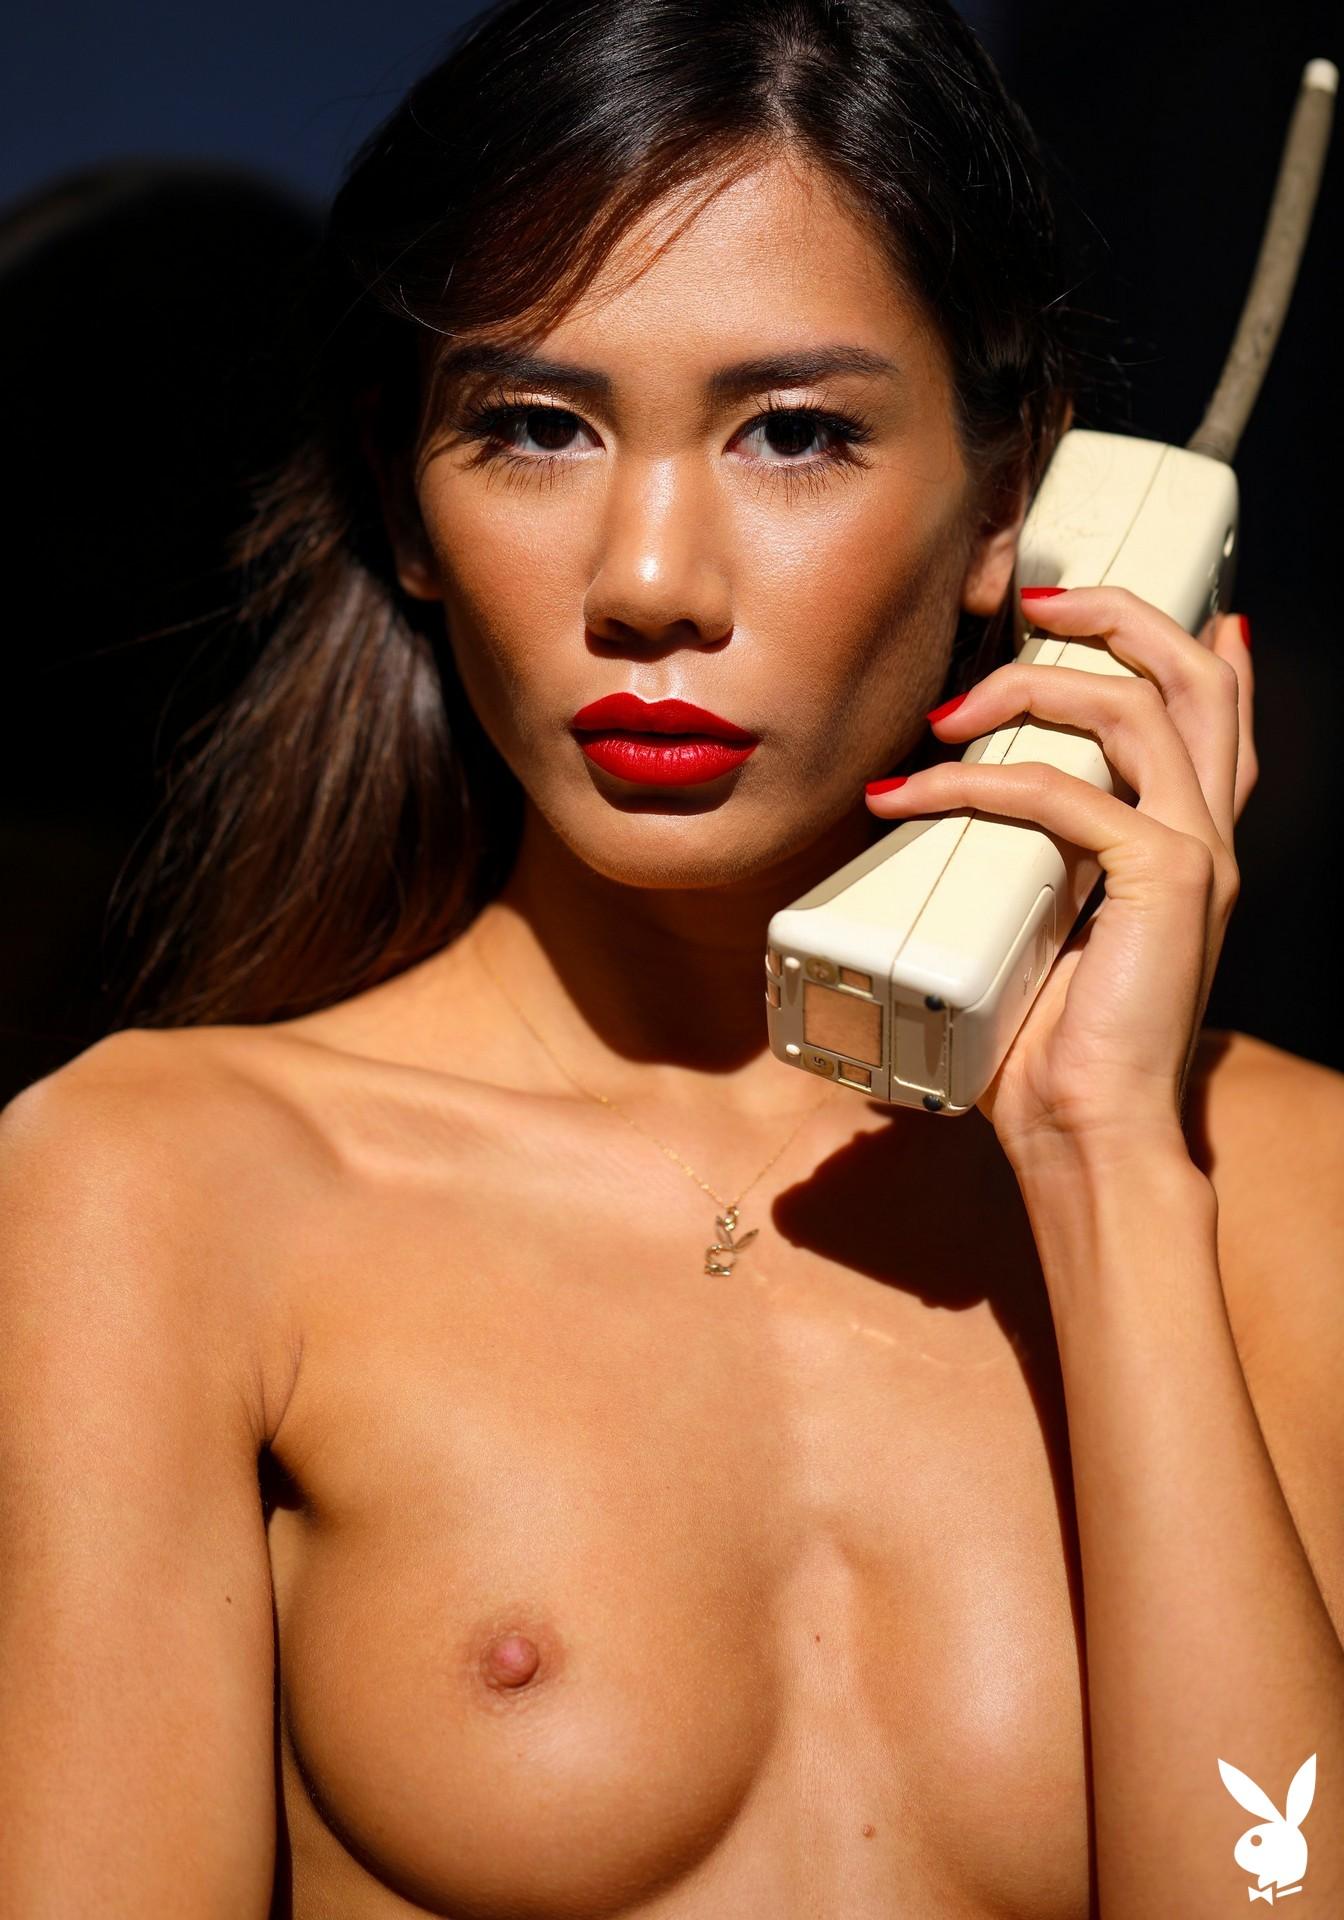 Cledia Fortin For Playboy International Playboy Plus (17)